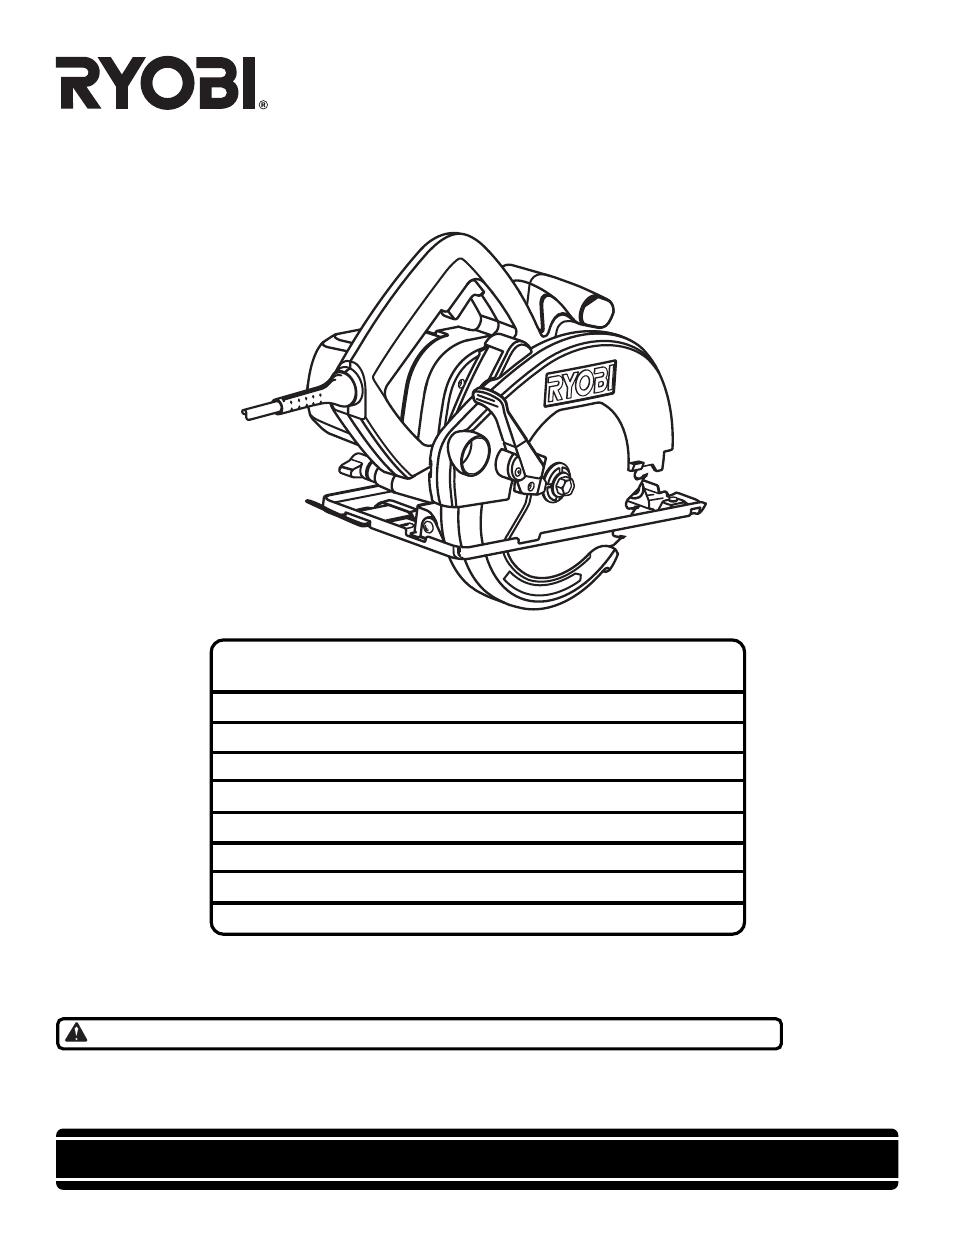 ryobi csb130js user manual 22 pages also for csb120 csb130 rh manualsdir com Ryobi Parts Ryobi Manual Rjc180